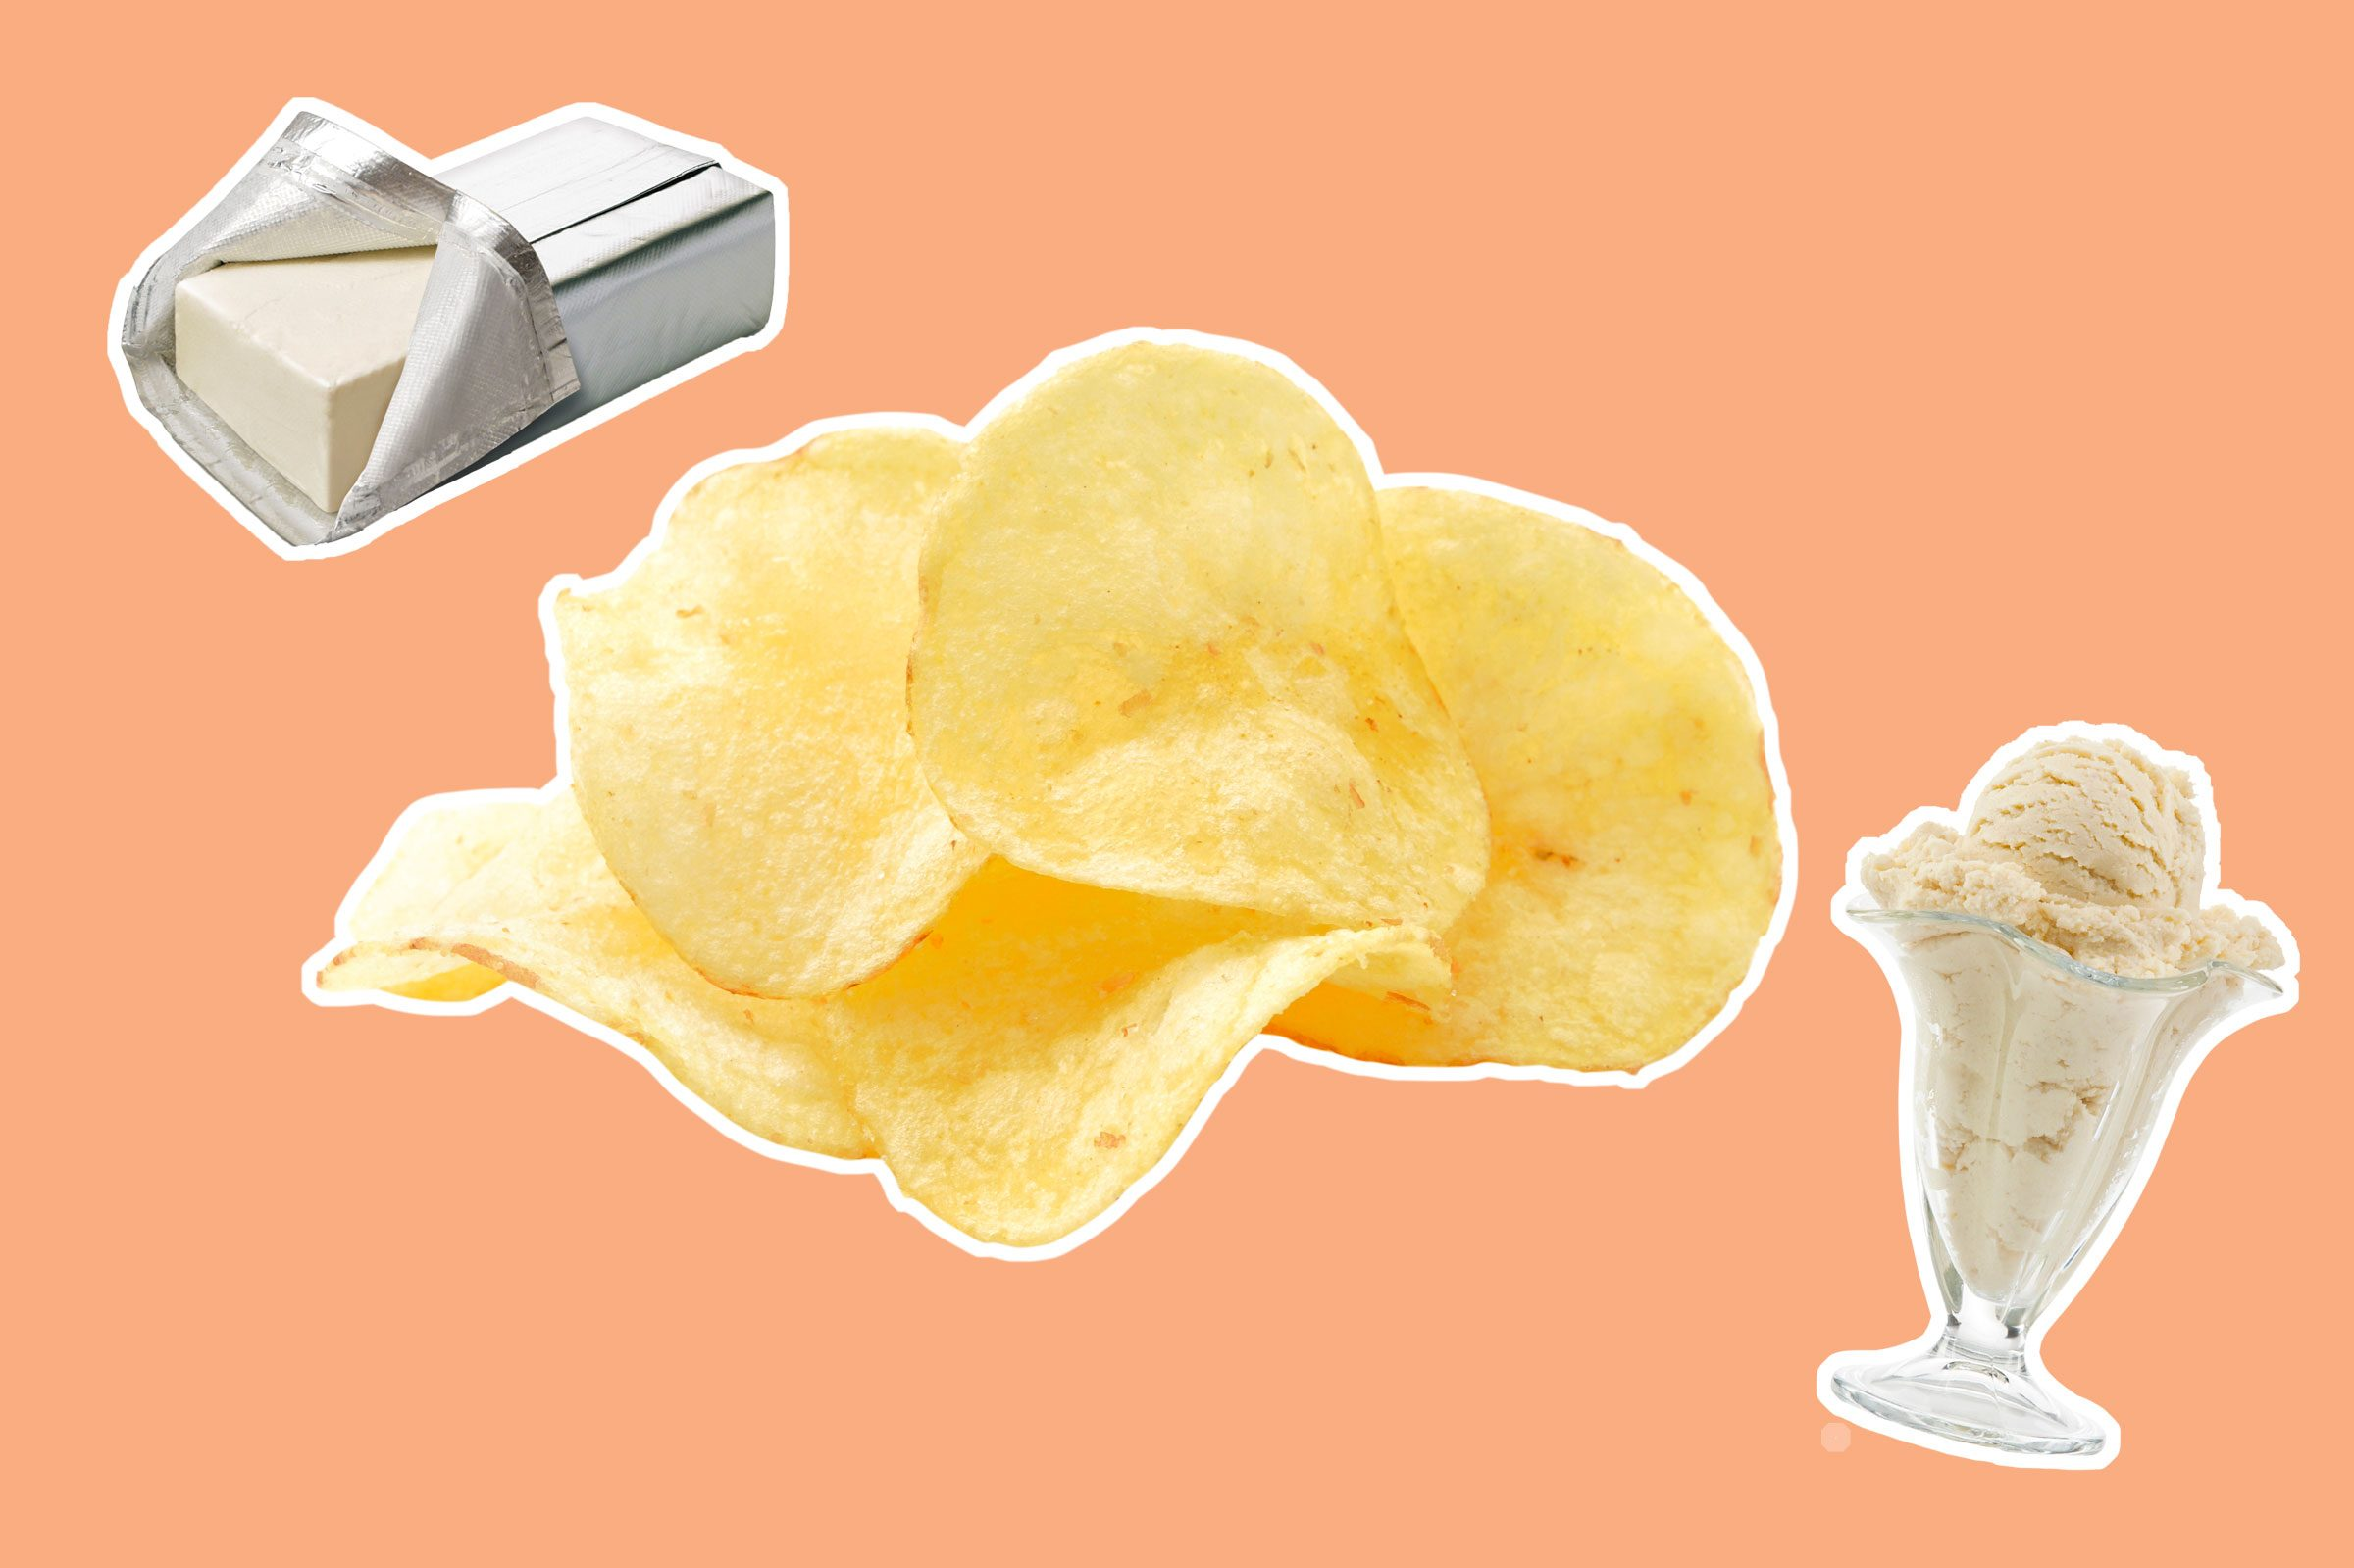 Weird Healthy Food Combinations